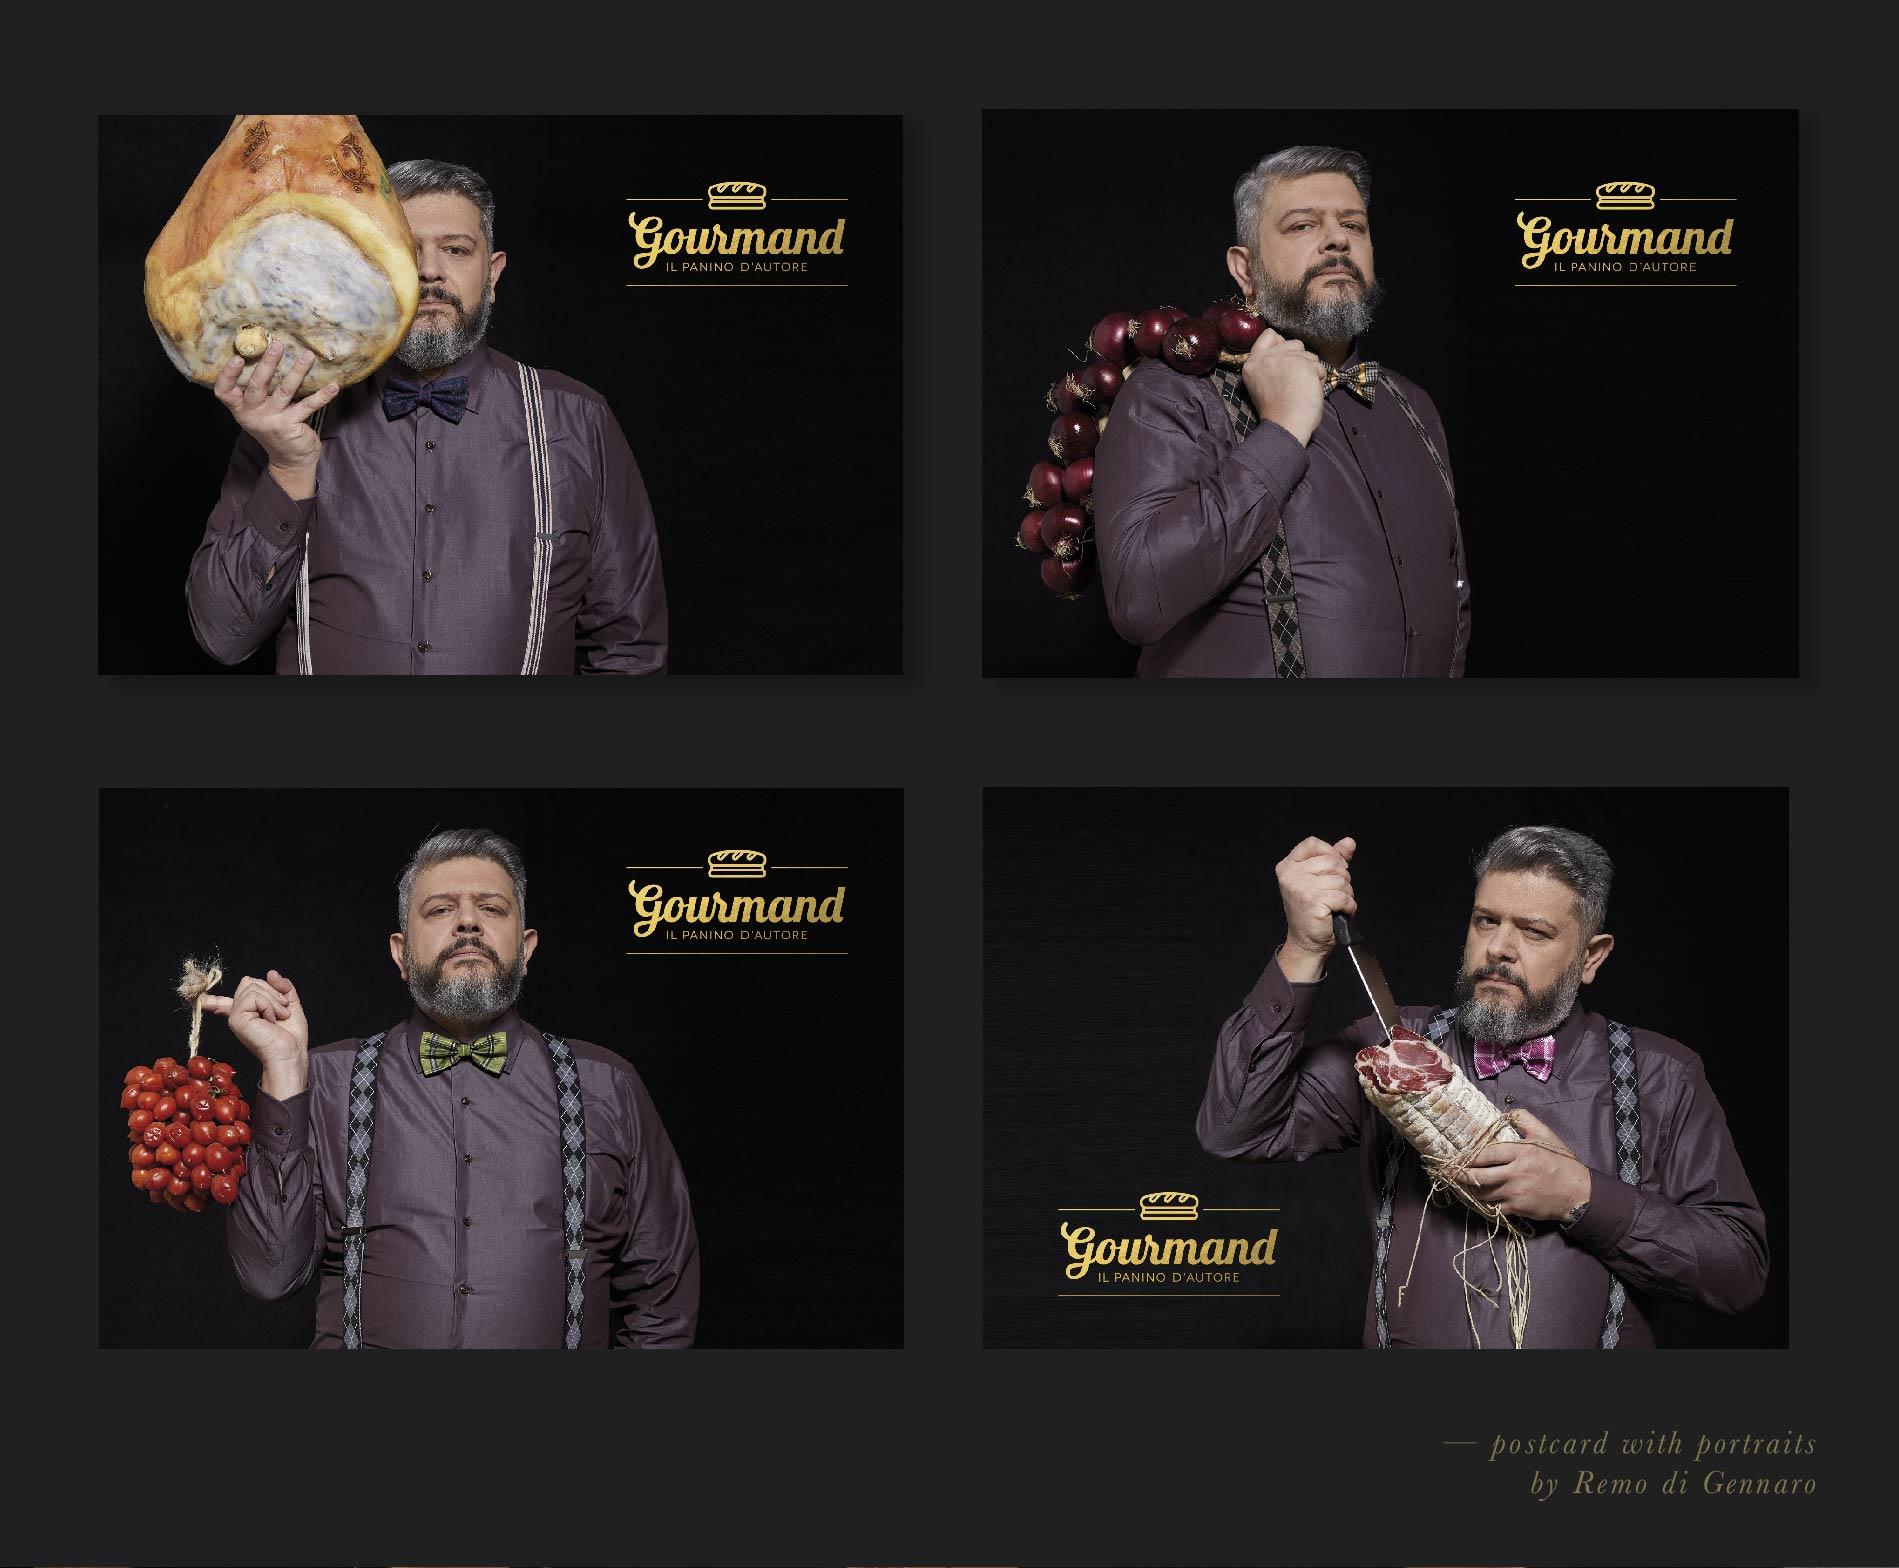 03-Gourmand-panino-autore-cartoline